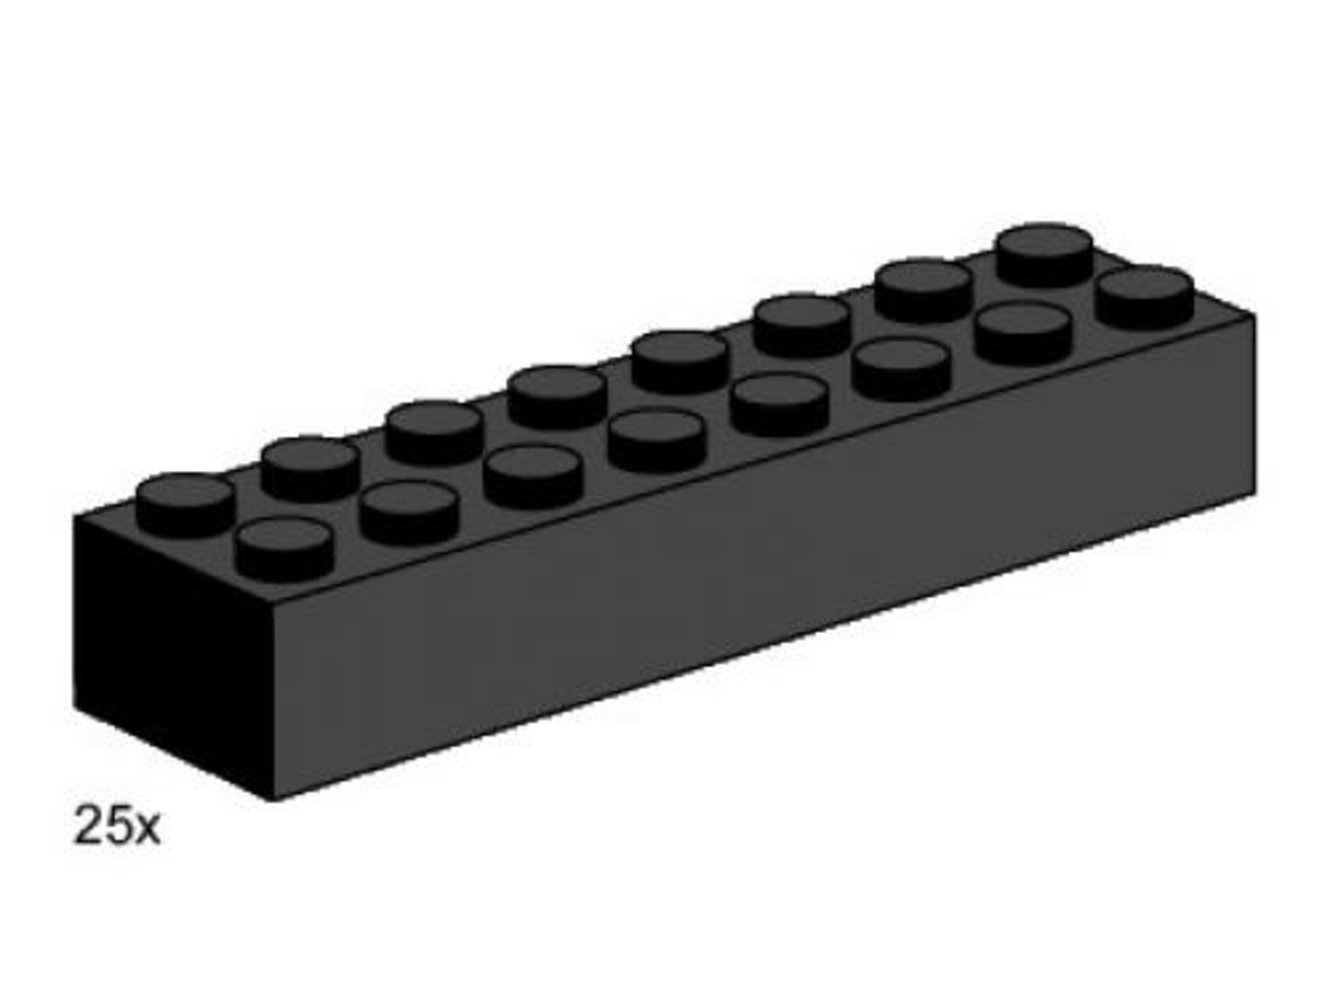 2 x 8 Black Bricks